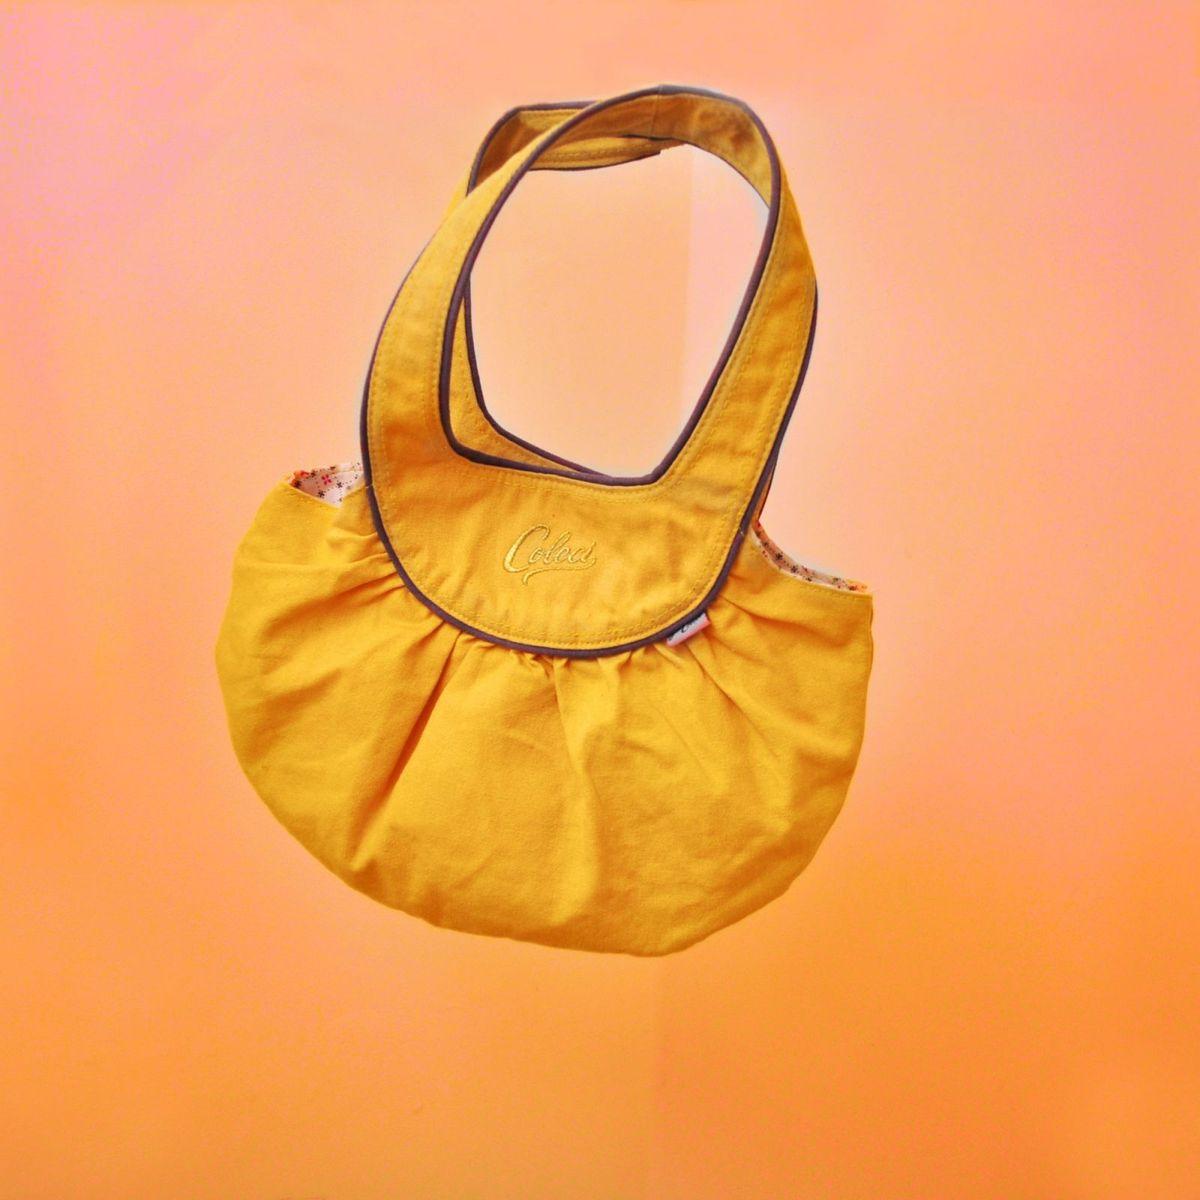 3fb843326 Bolsa Colcci - Amarela | Bolsa de Ombro Feminina Colcci Usado 29360864 |  enjoei